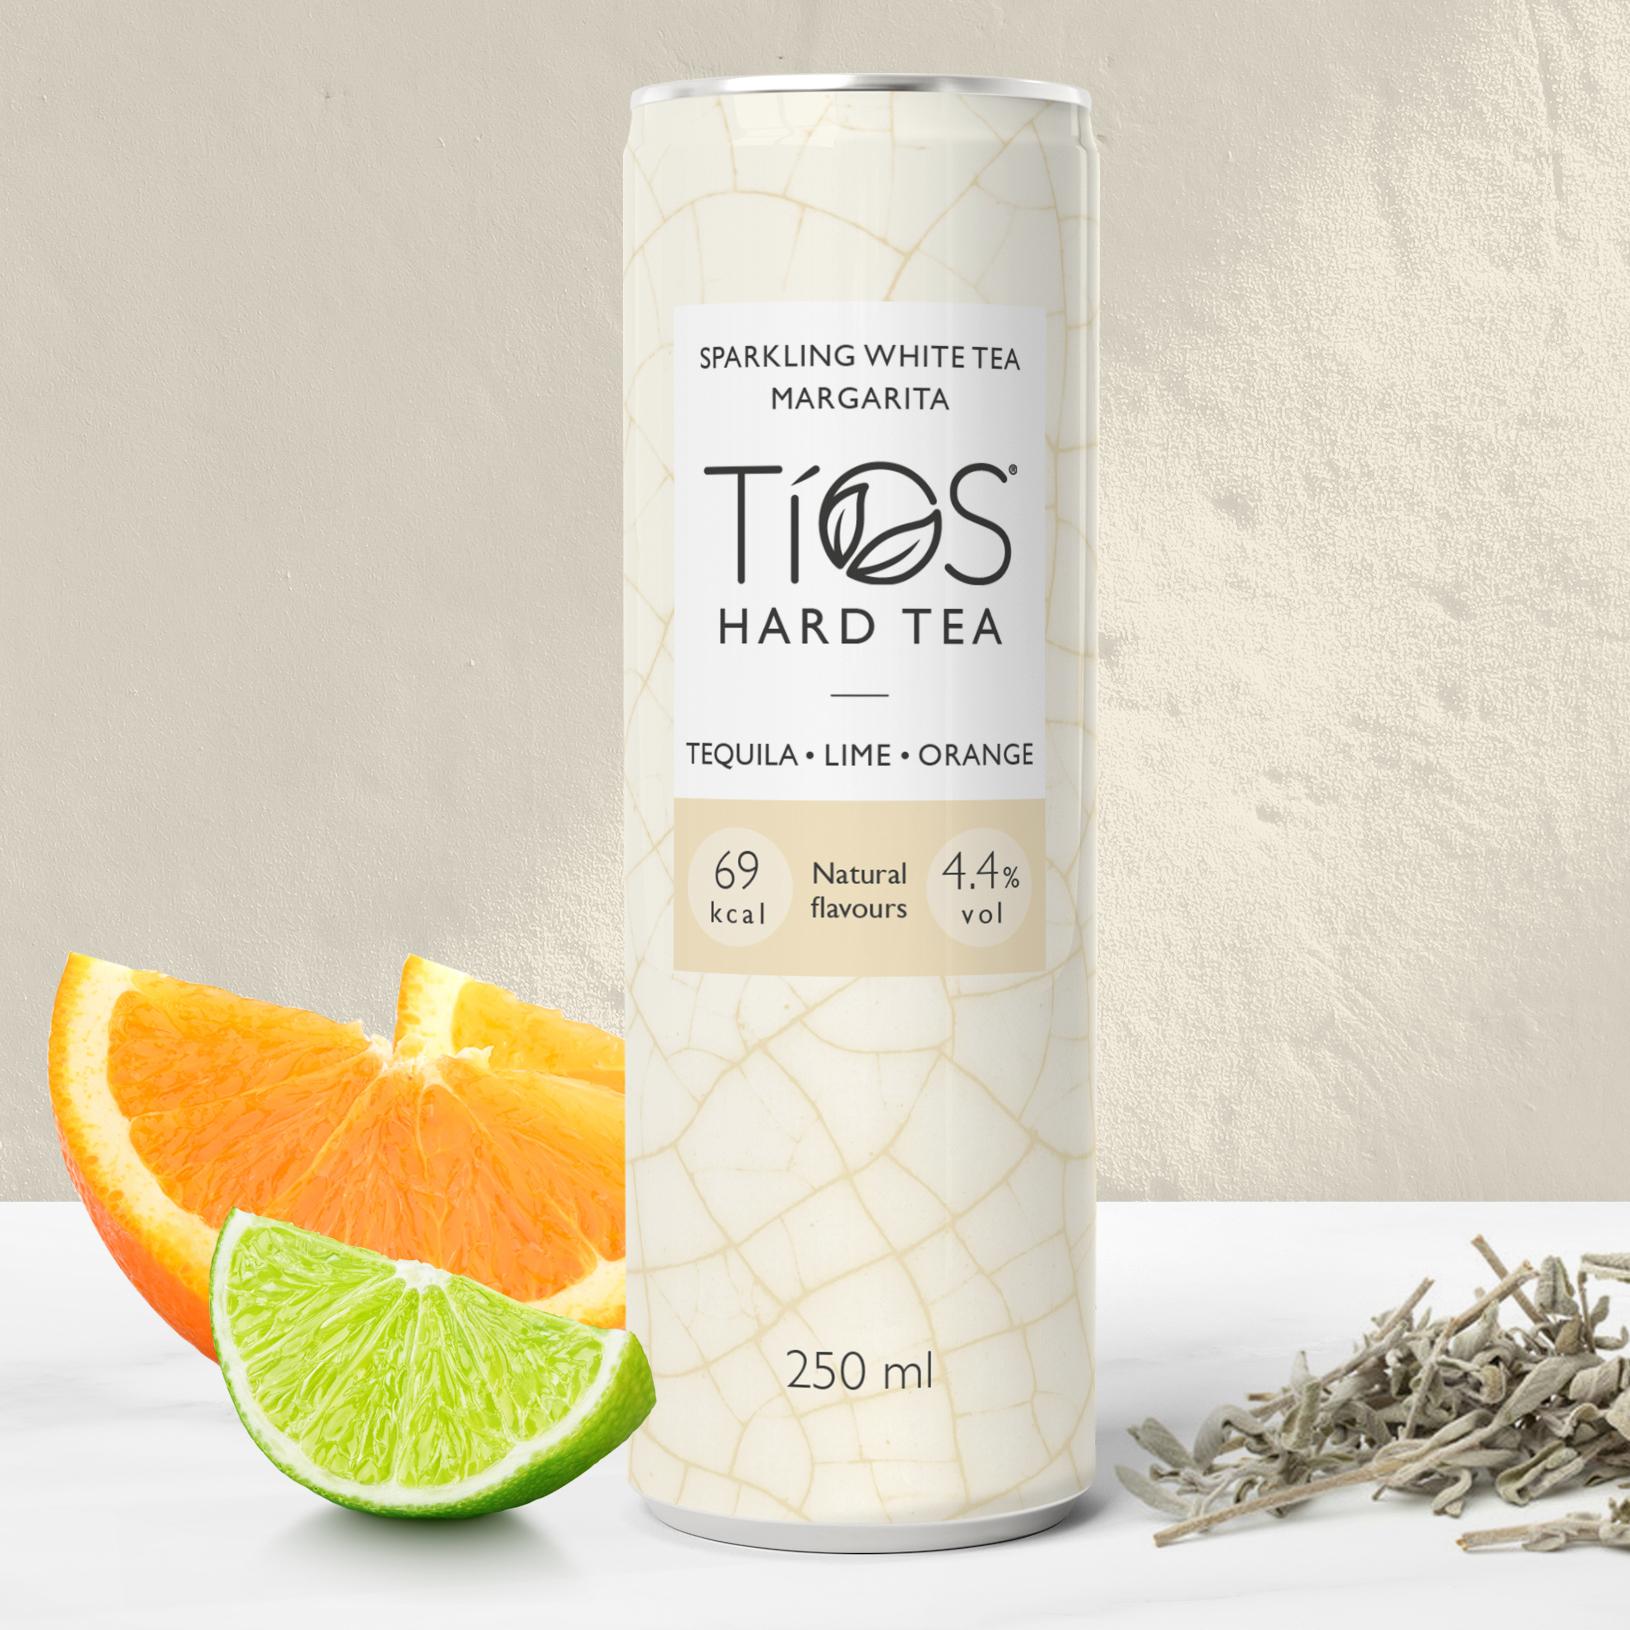 Tios White Tea Margarita can with ingredients